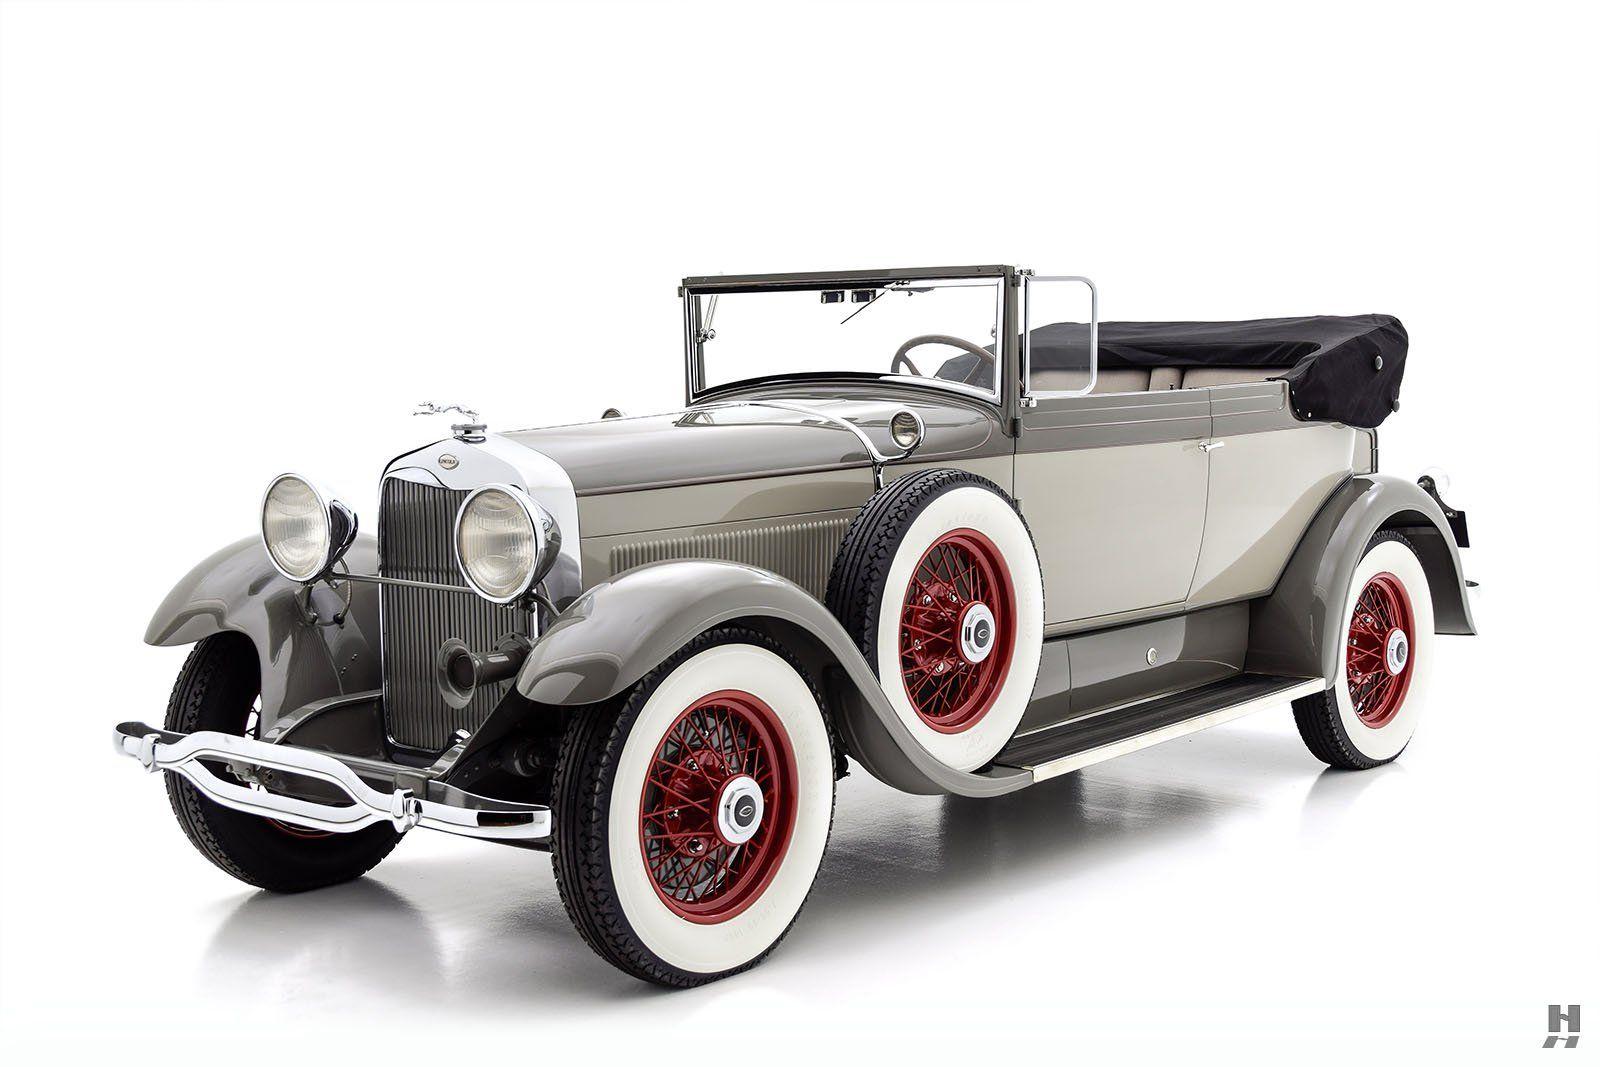 1929 Lincoln Model L Convertible Victoria Lincoln models